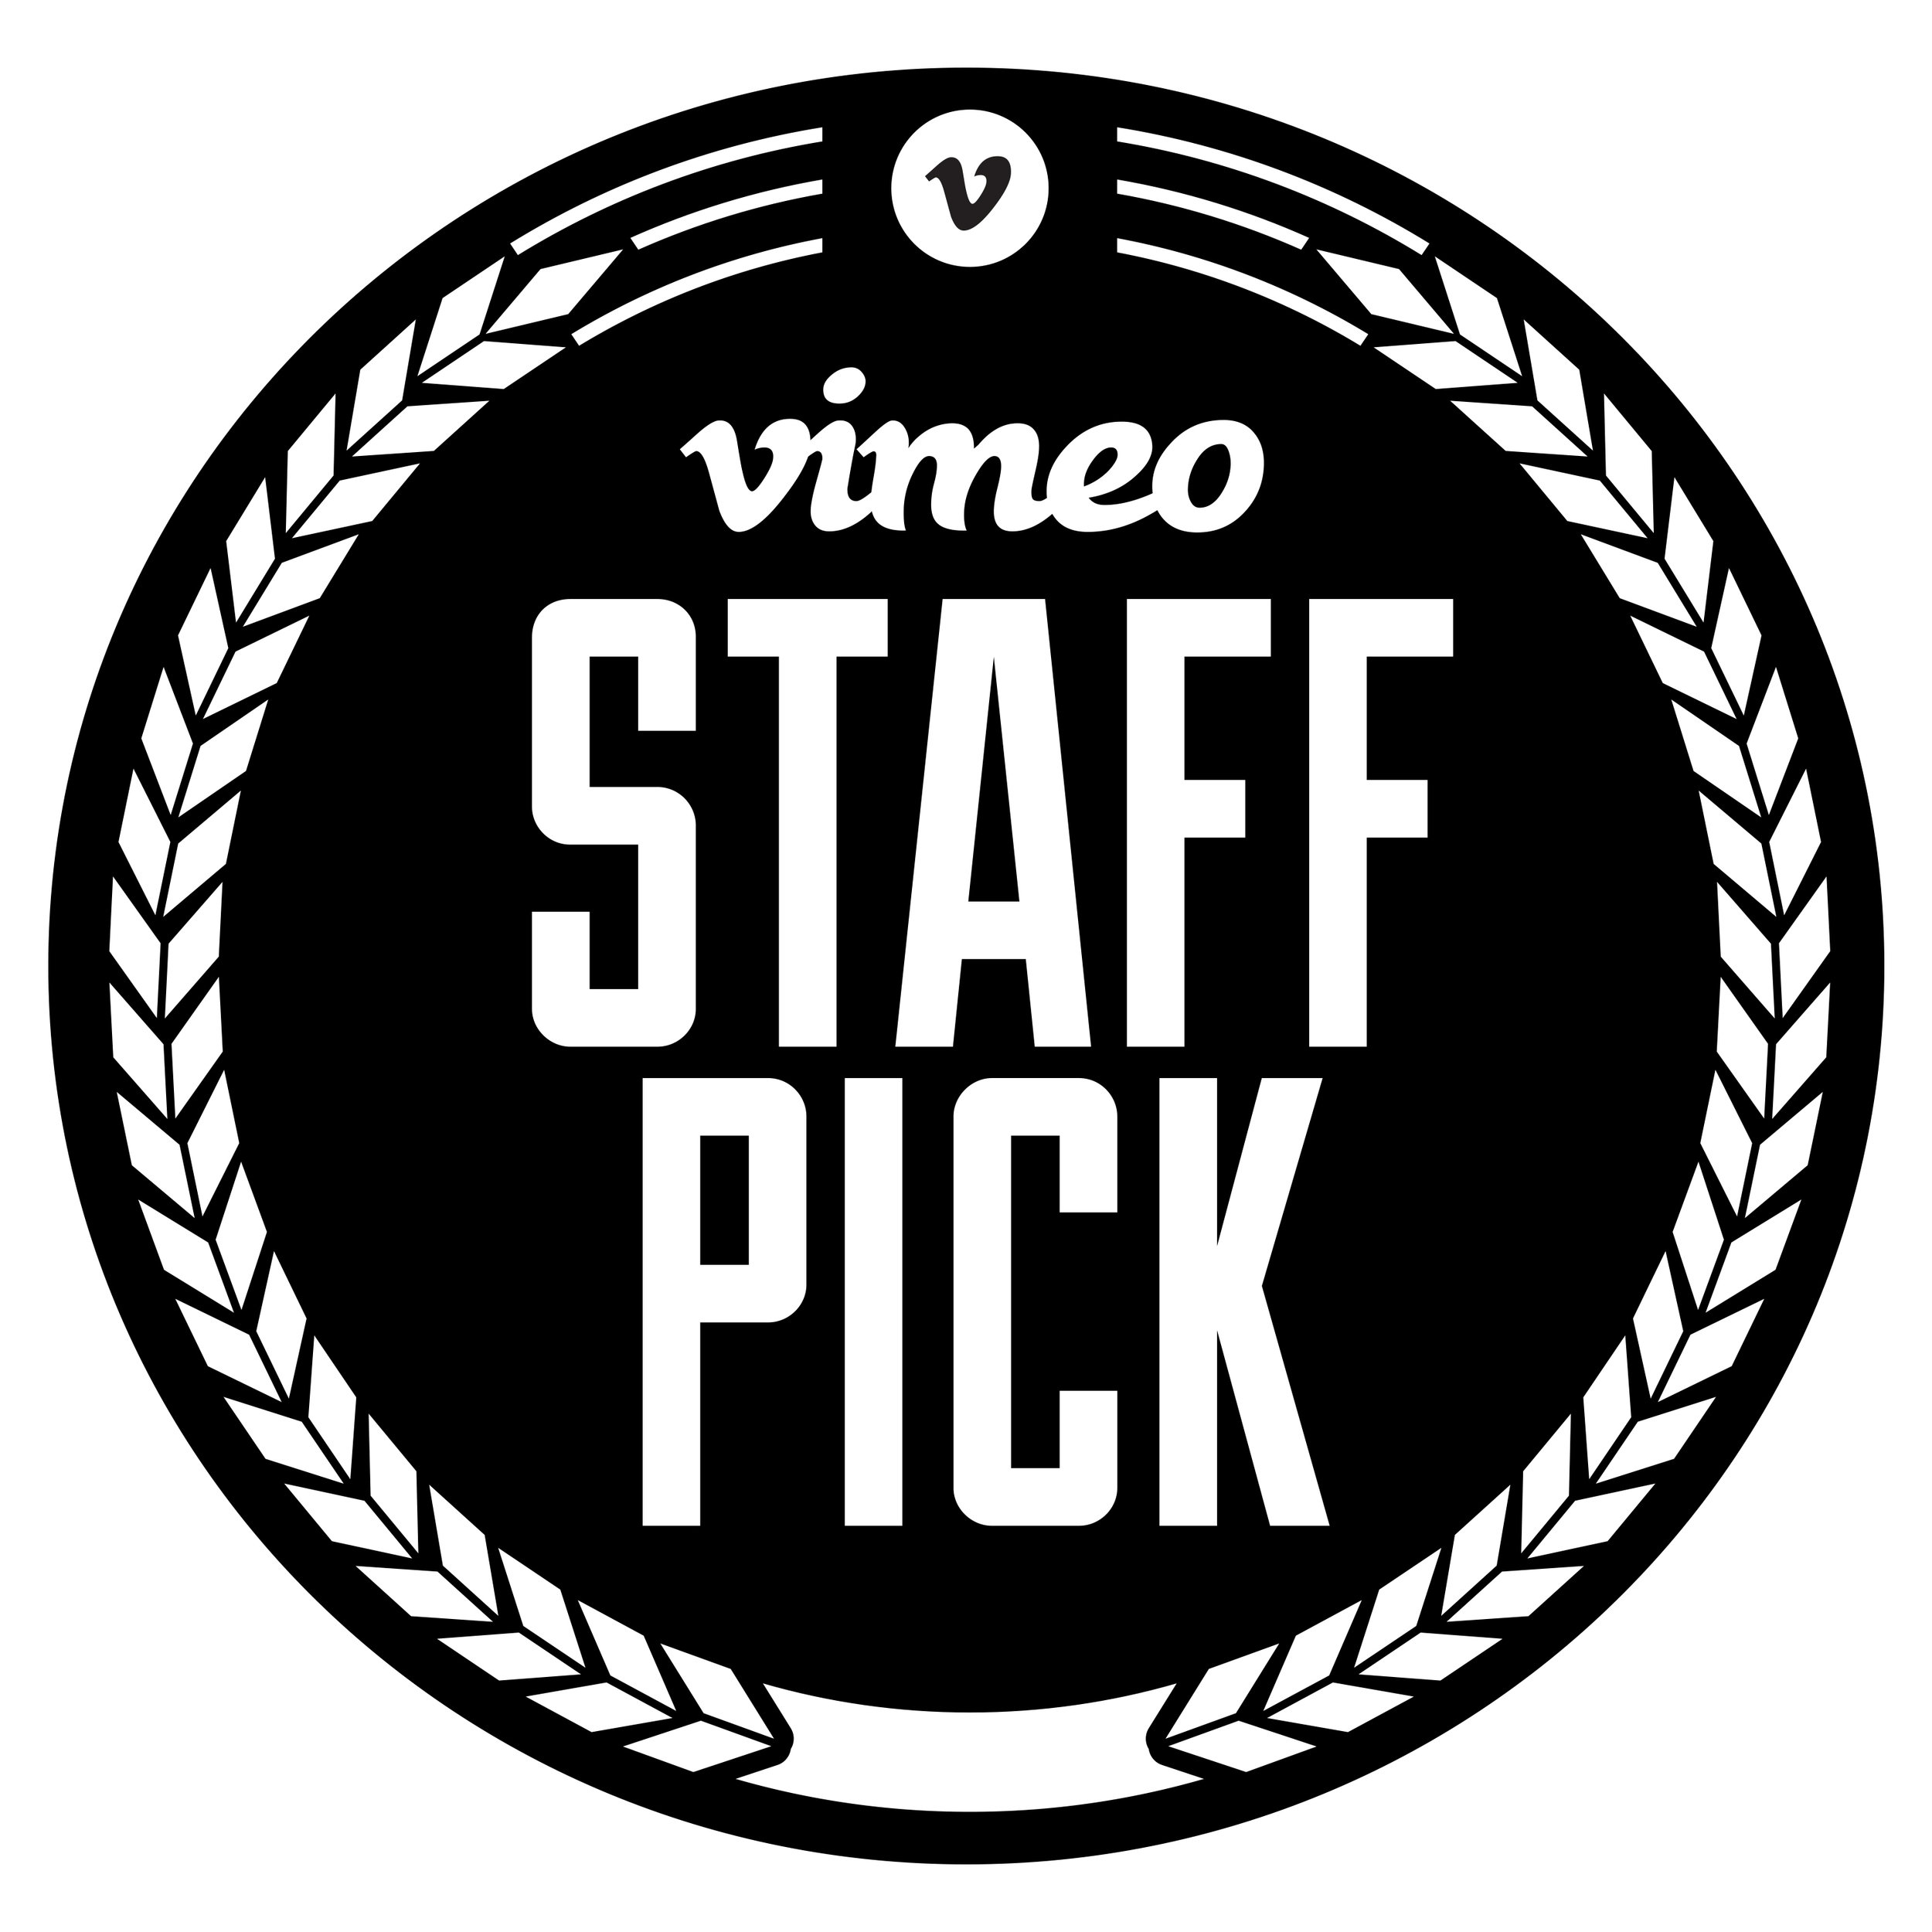 vimeo-staff-picks-logo.jpg